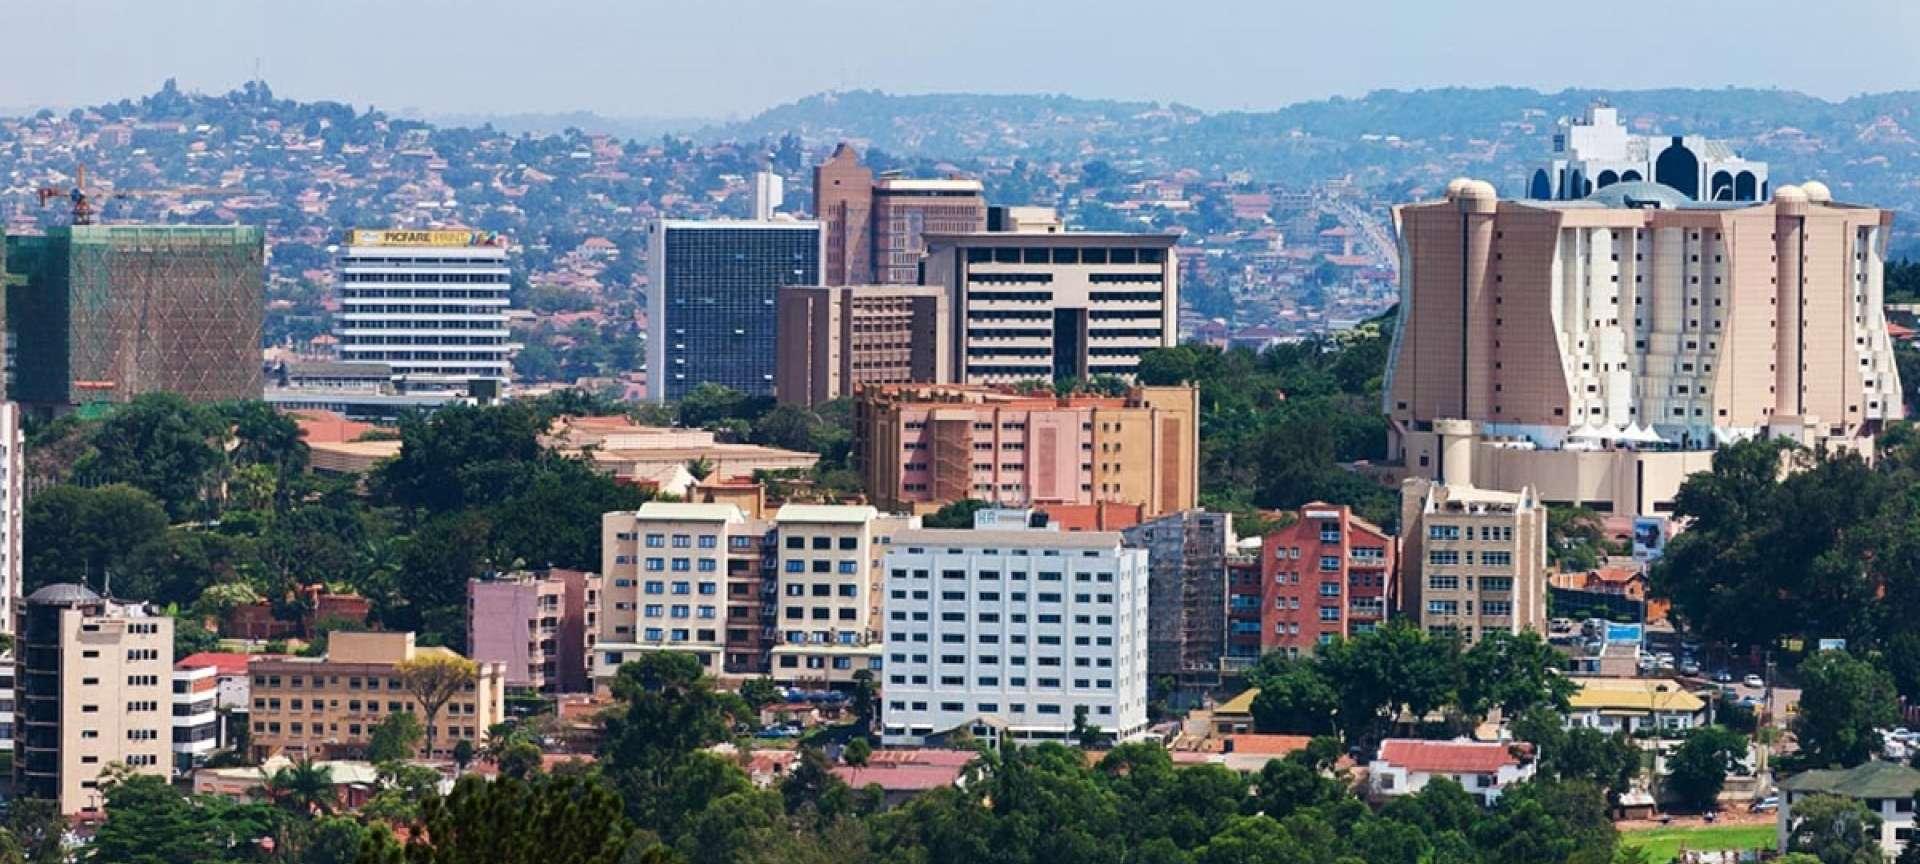 Uganda upgrades seven regions to cities with economic development in view